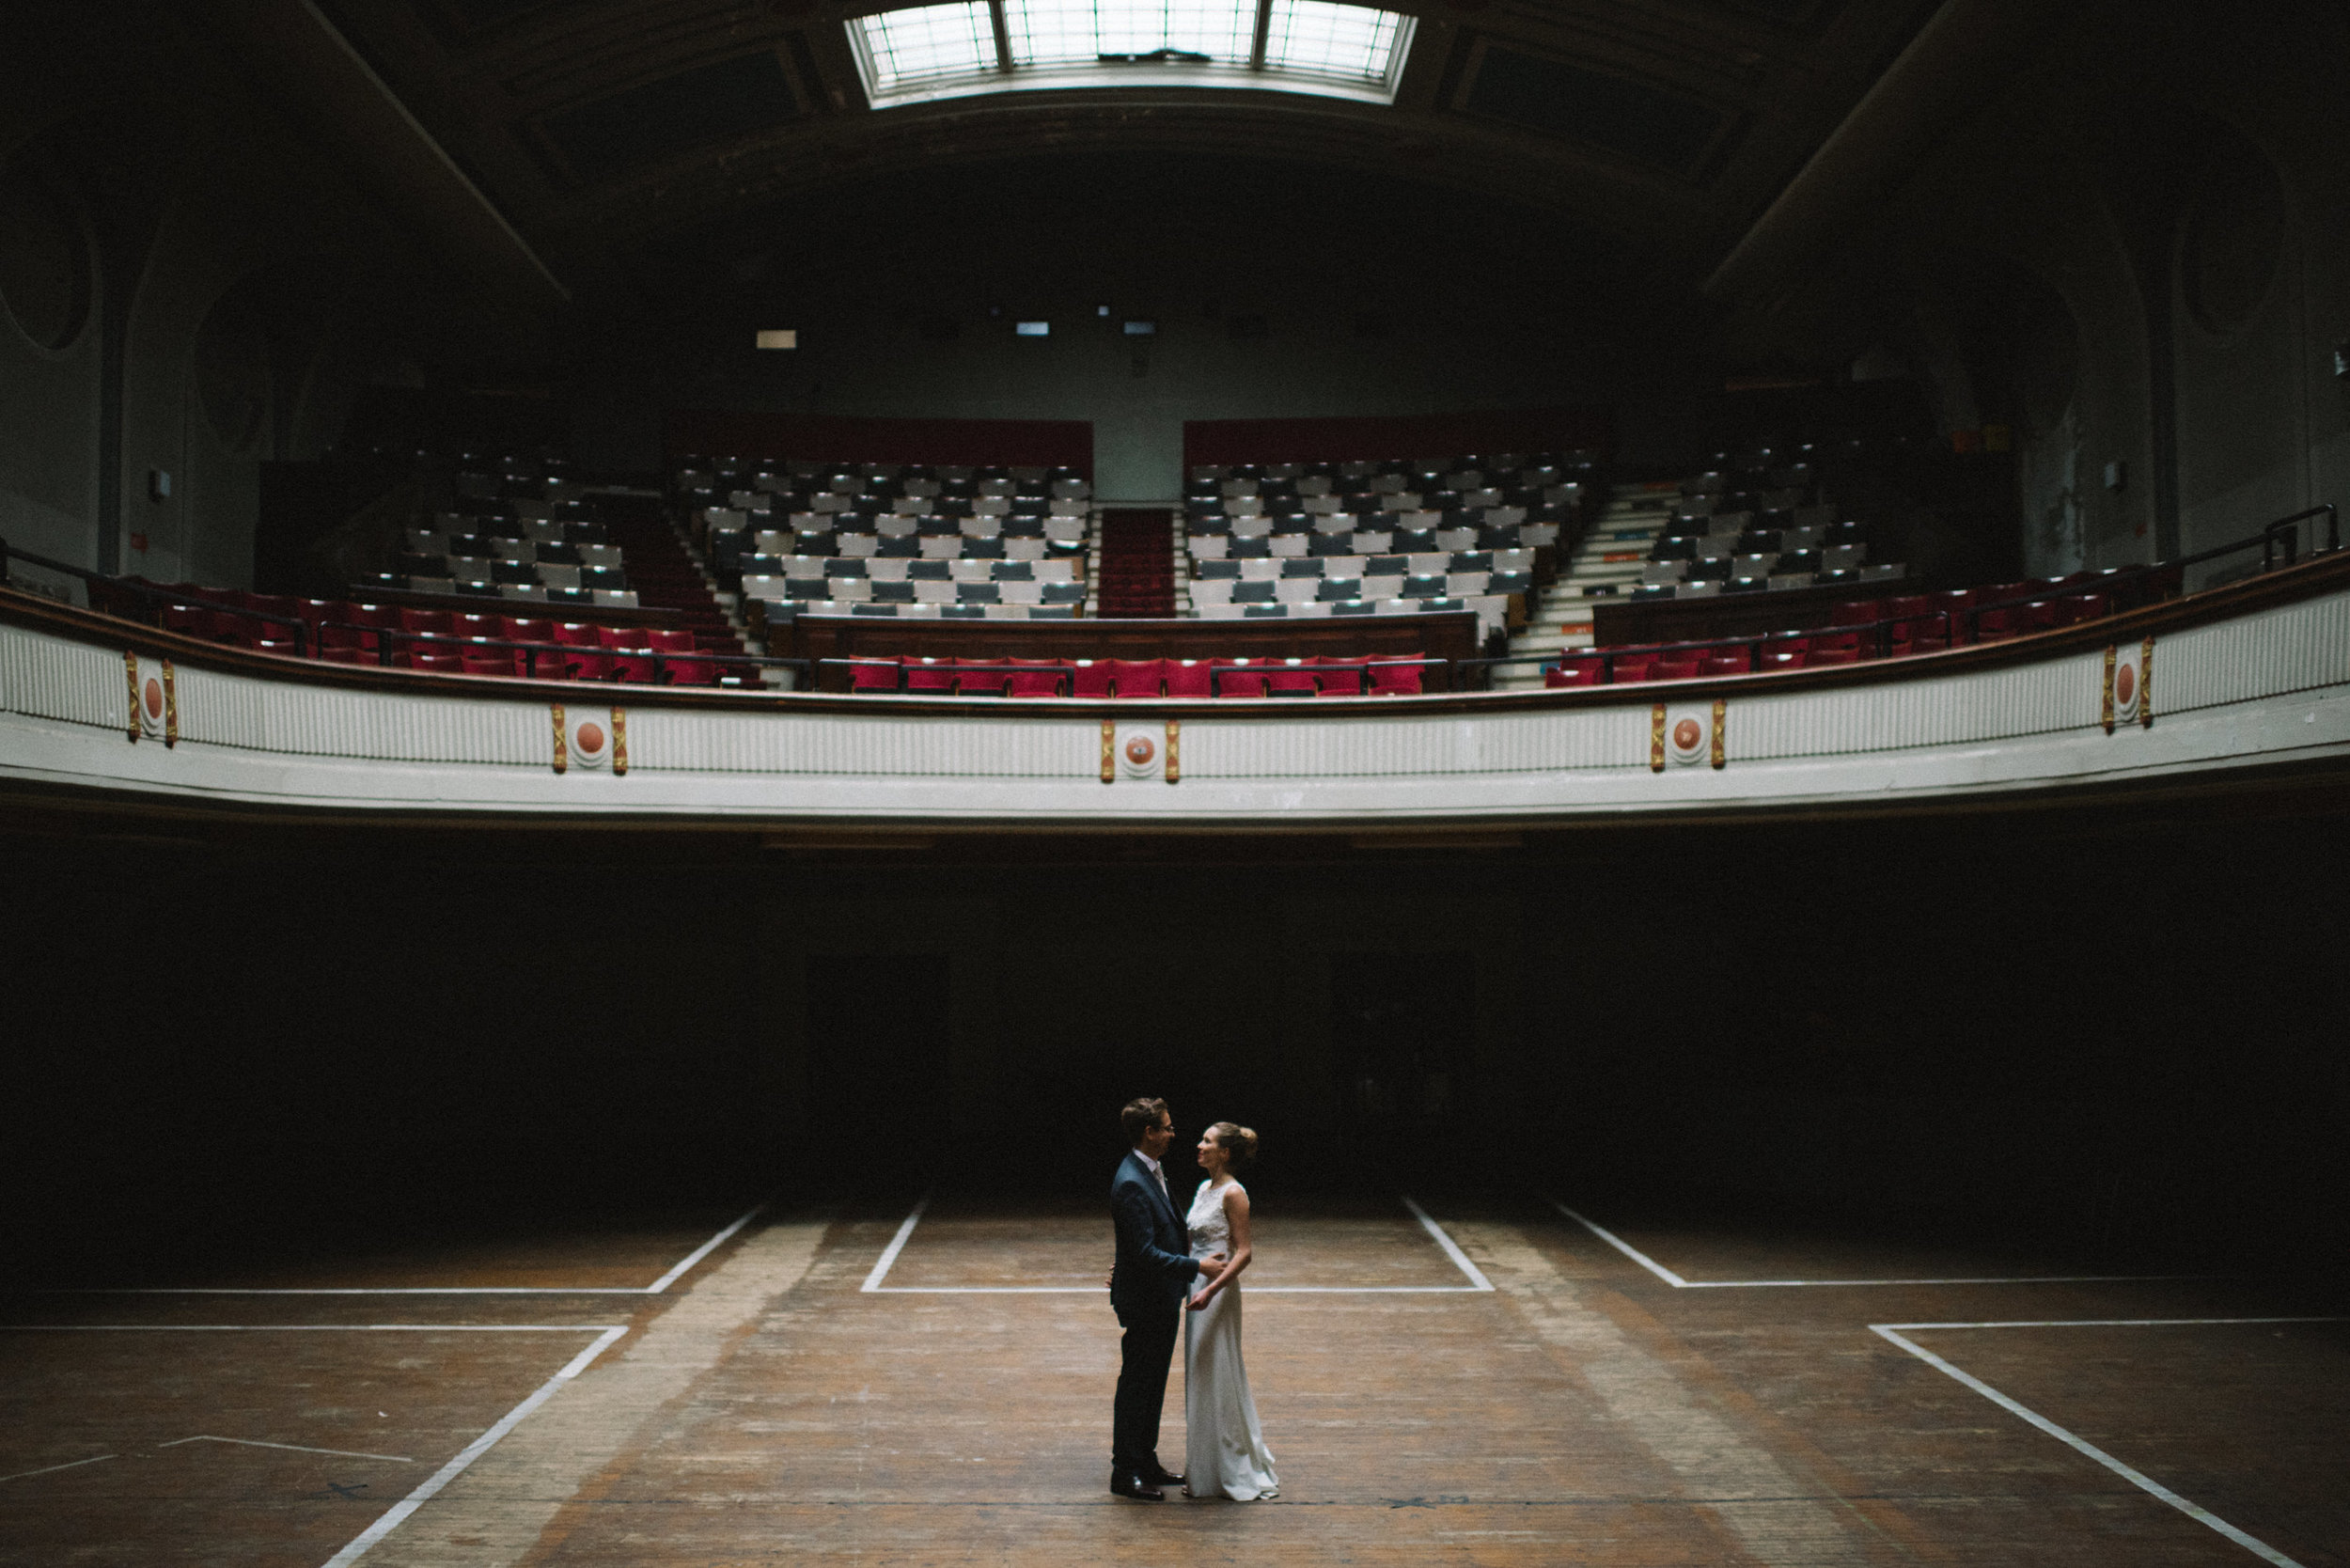 0094-LISA-DEVINE-PHOTOGRAPHY-ALTERNATIVE-WEDDING-PHOTOGRAPHY-SCOTLAND-DESTINATION-WEDDINGS-GLASGOW-WEDDINGS-COOL-WEDDINGS-STYLISH-WEDDINGS.JPG